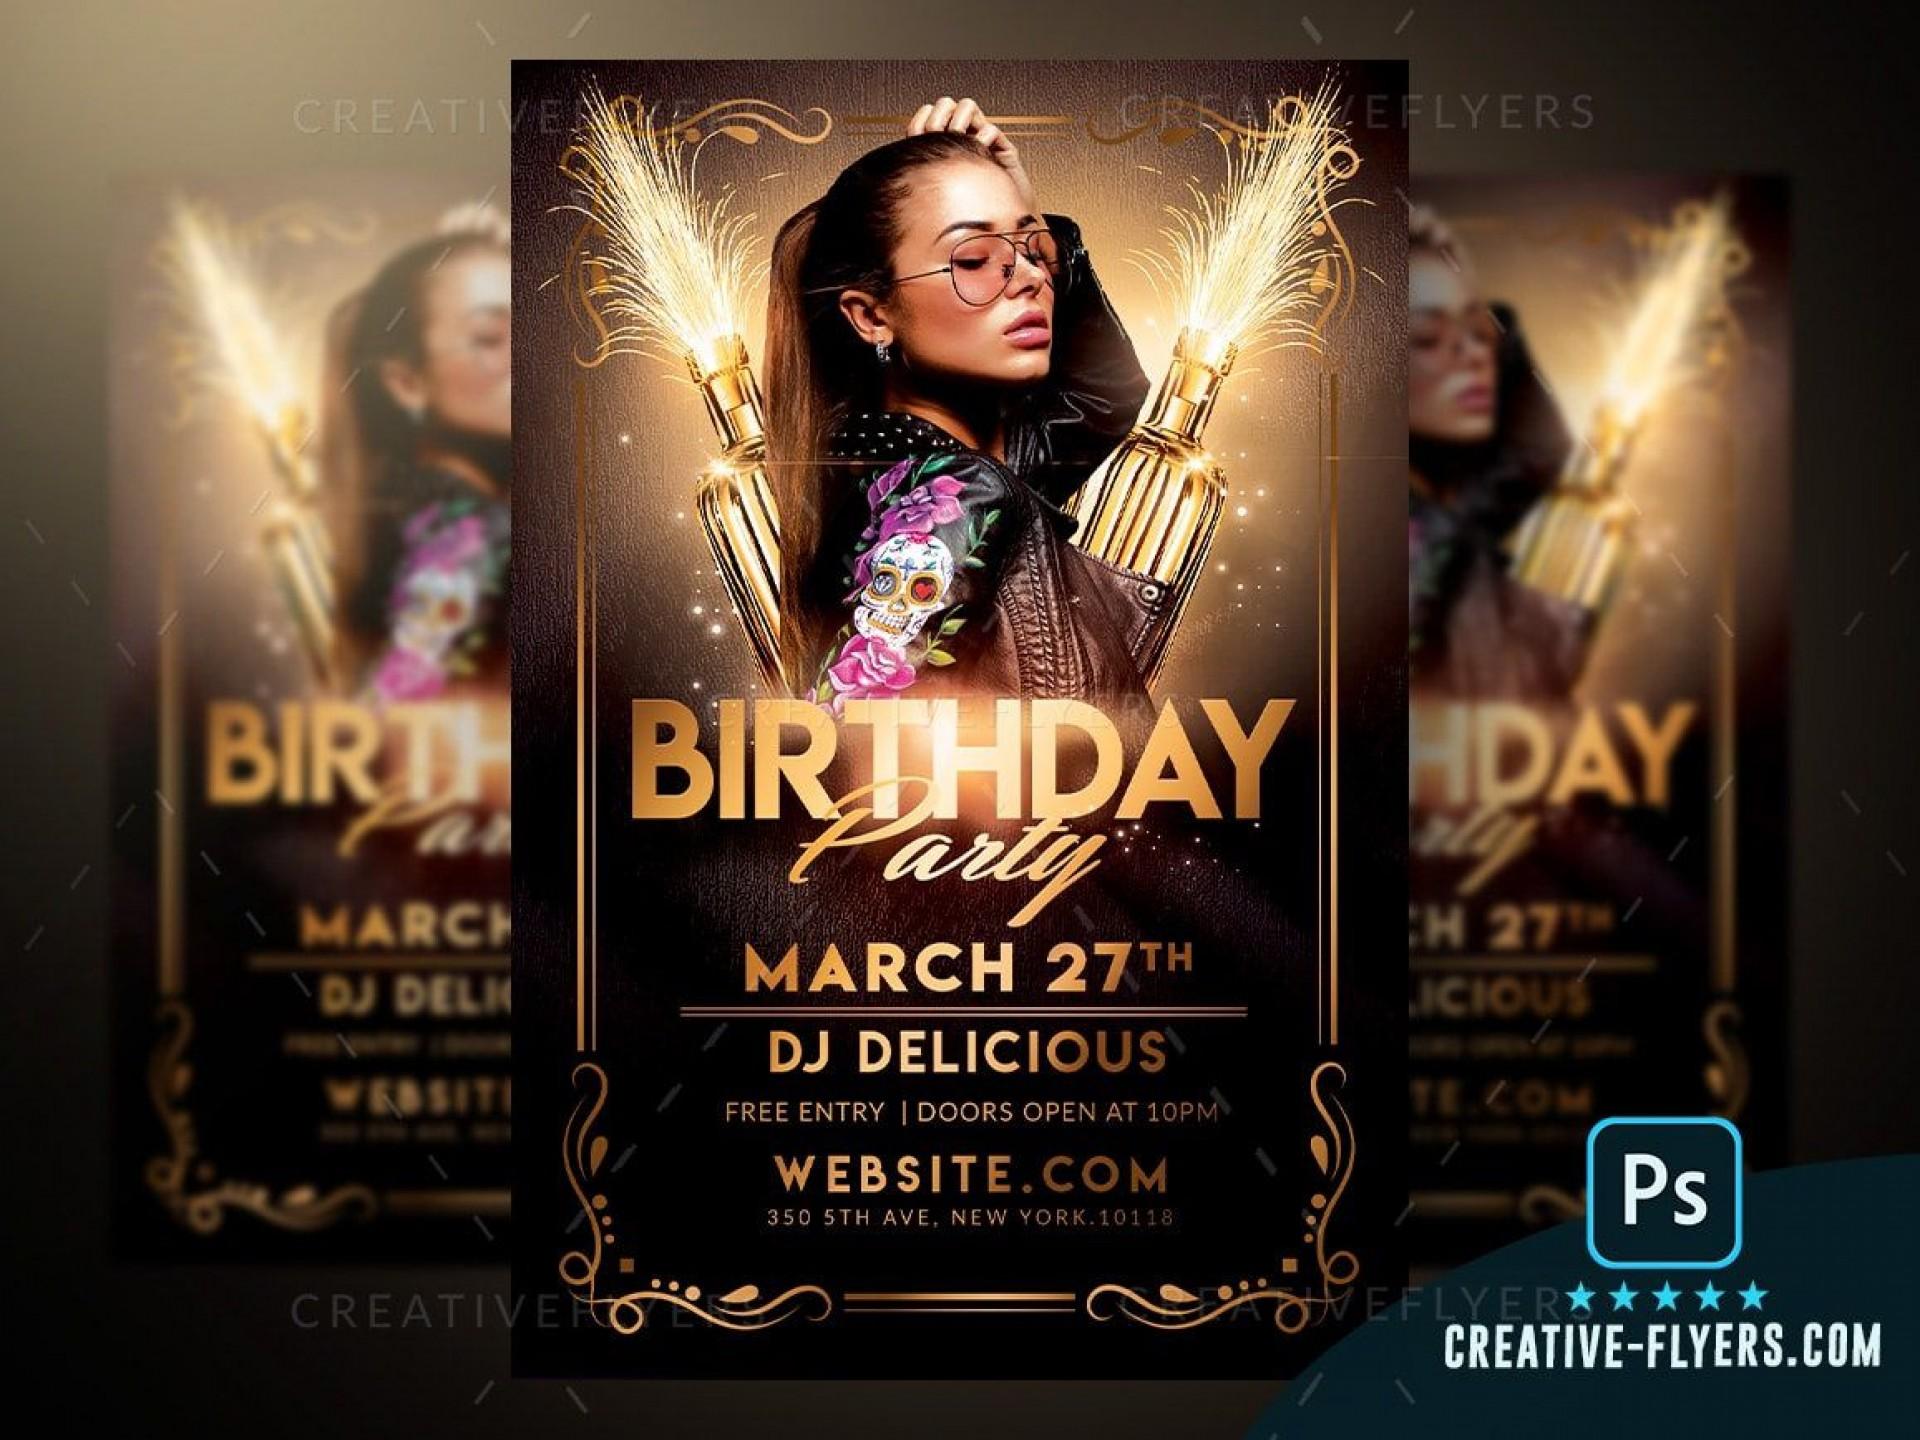 007 Unforgettable Free Birthday Flyer Template Psd Idea  Foam Party - Neon Glow Download Pool1920